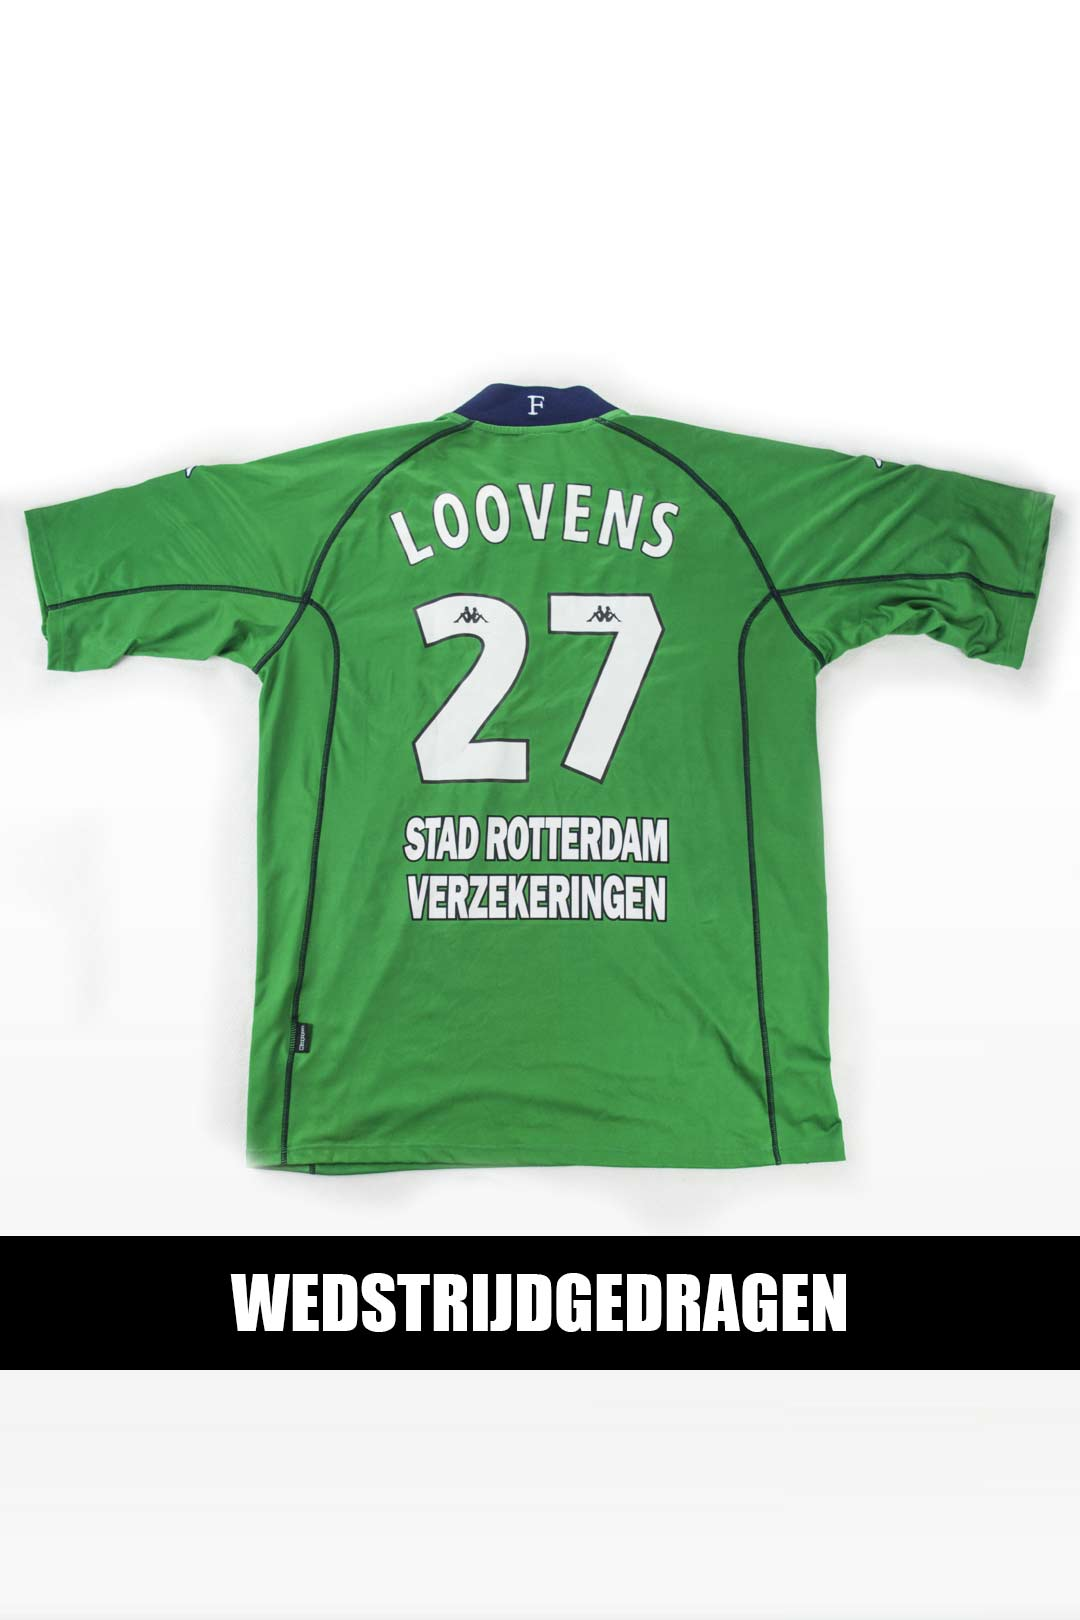 MATCHWORN Feyenoord Uitshirt - 2002 - 2003, Glenn Loovens